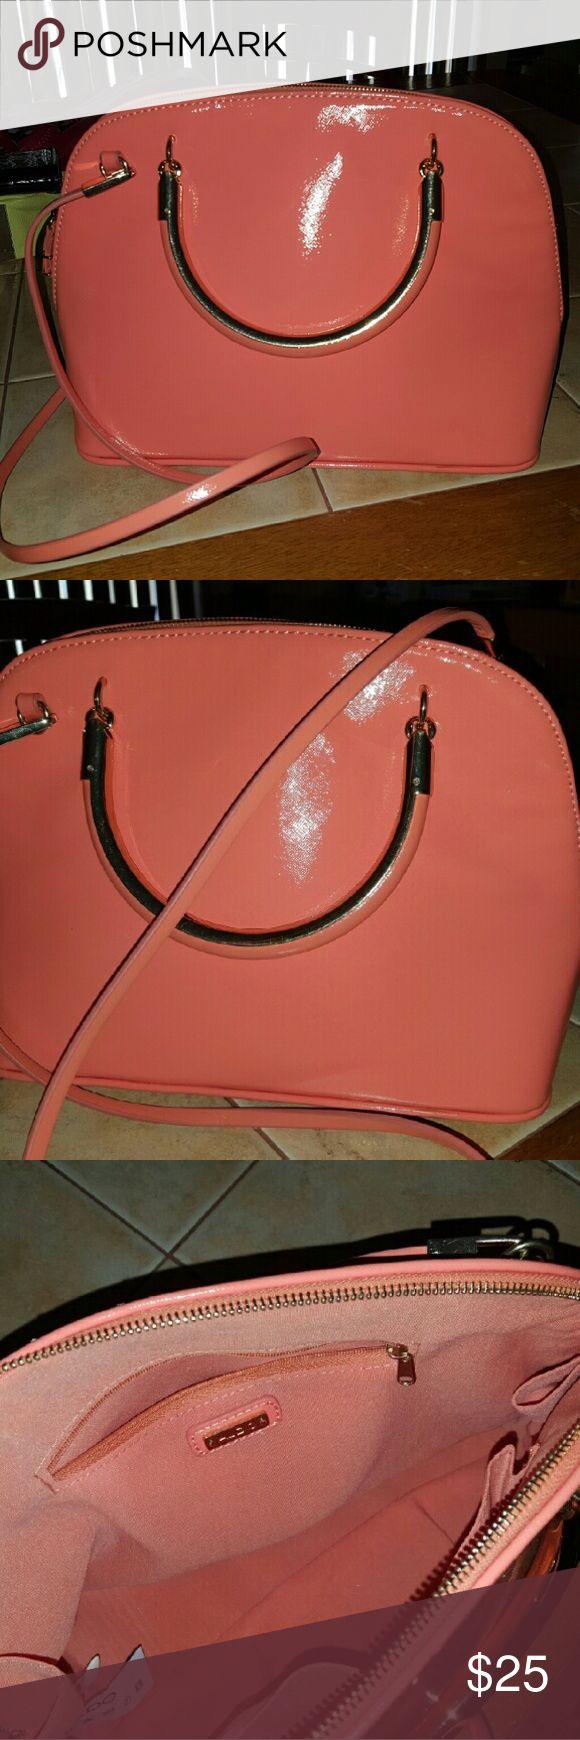 Aldo purse Beautiful Peach colored Aldo purse goes great with any outfit ****Bundle & save Aldo Bags